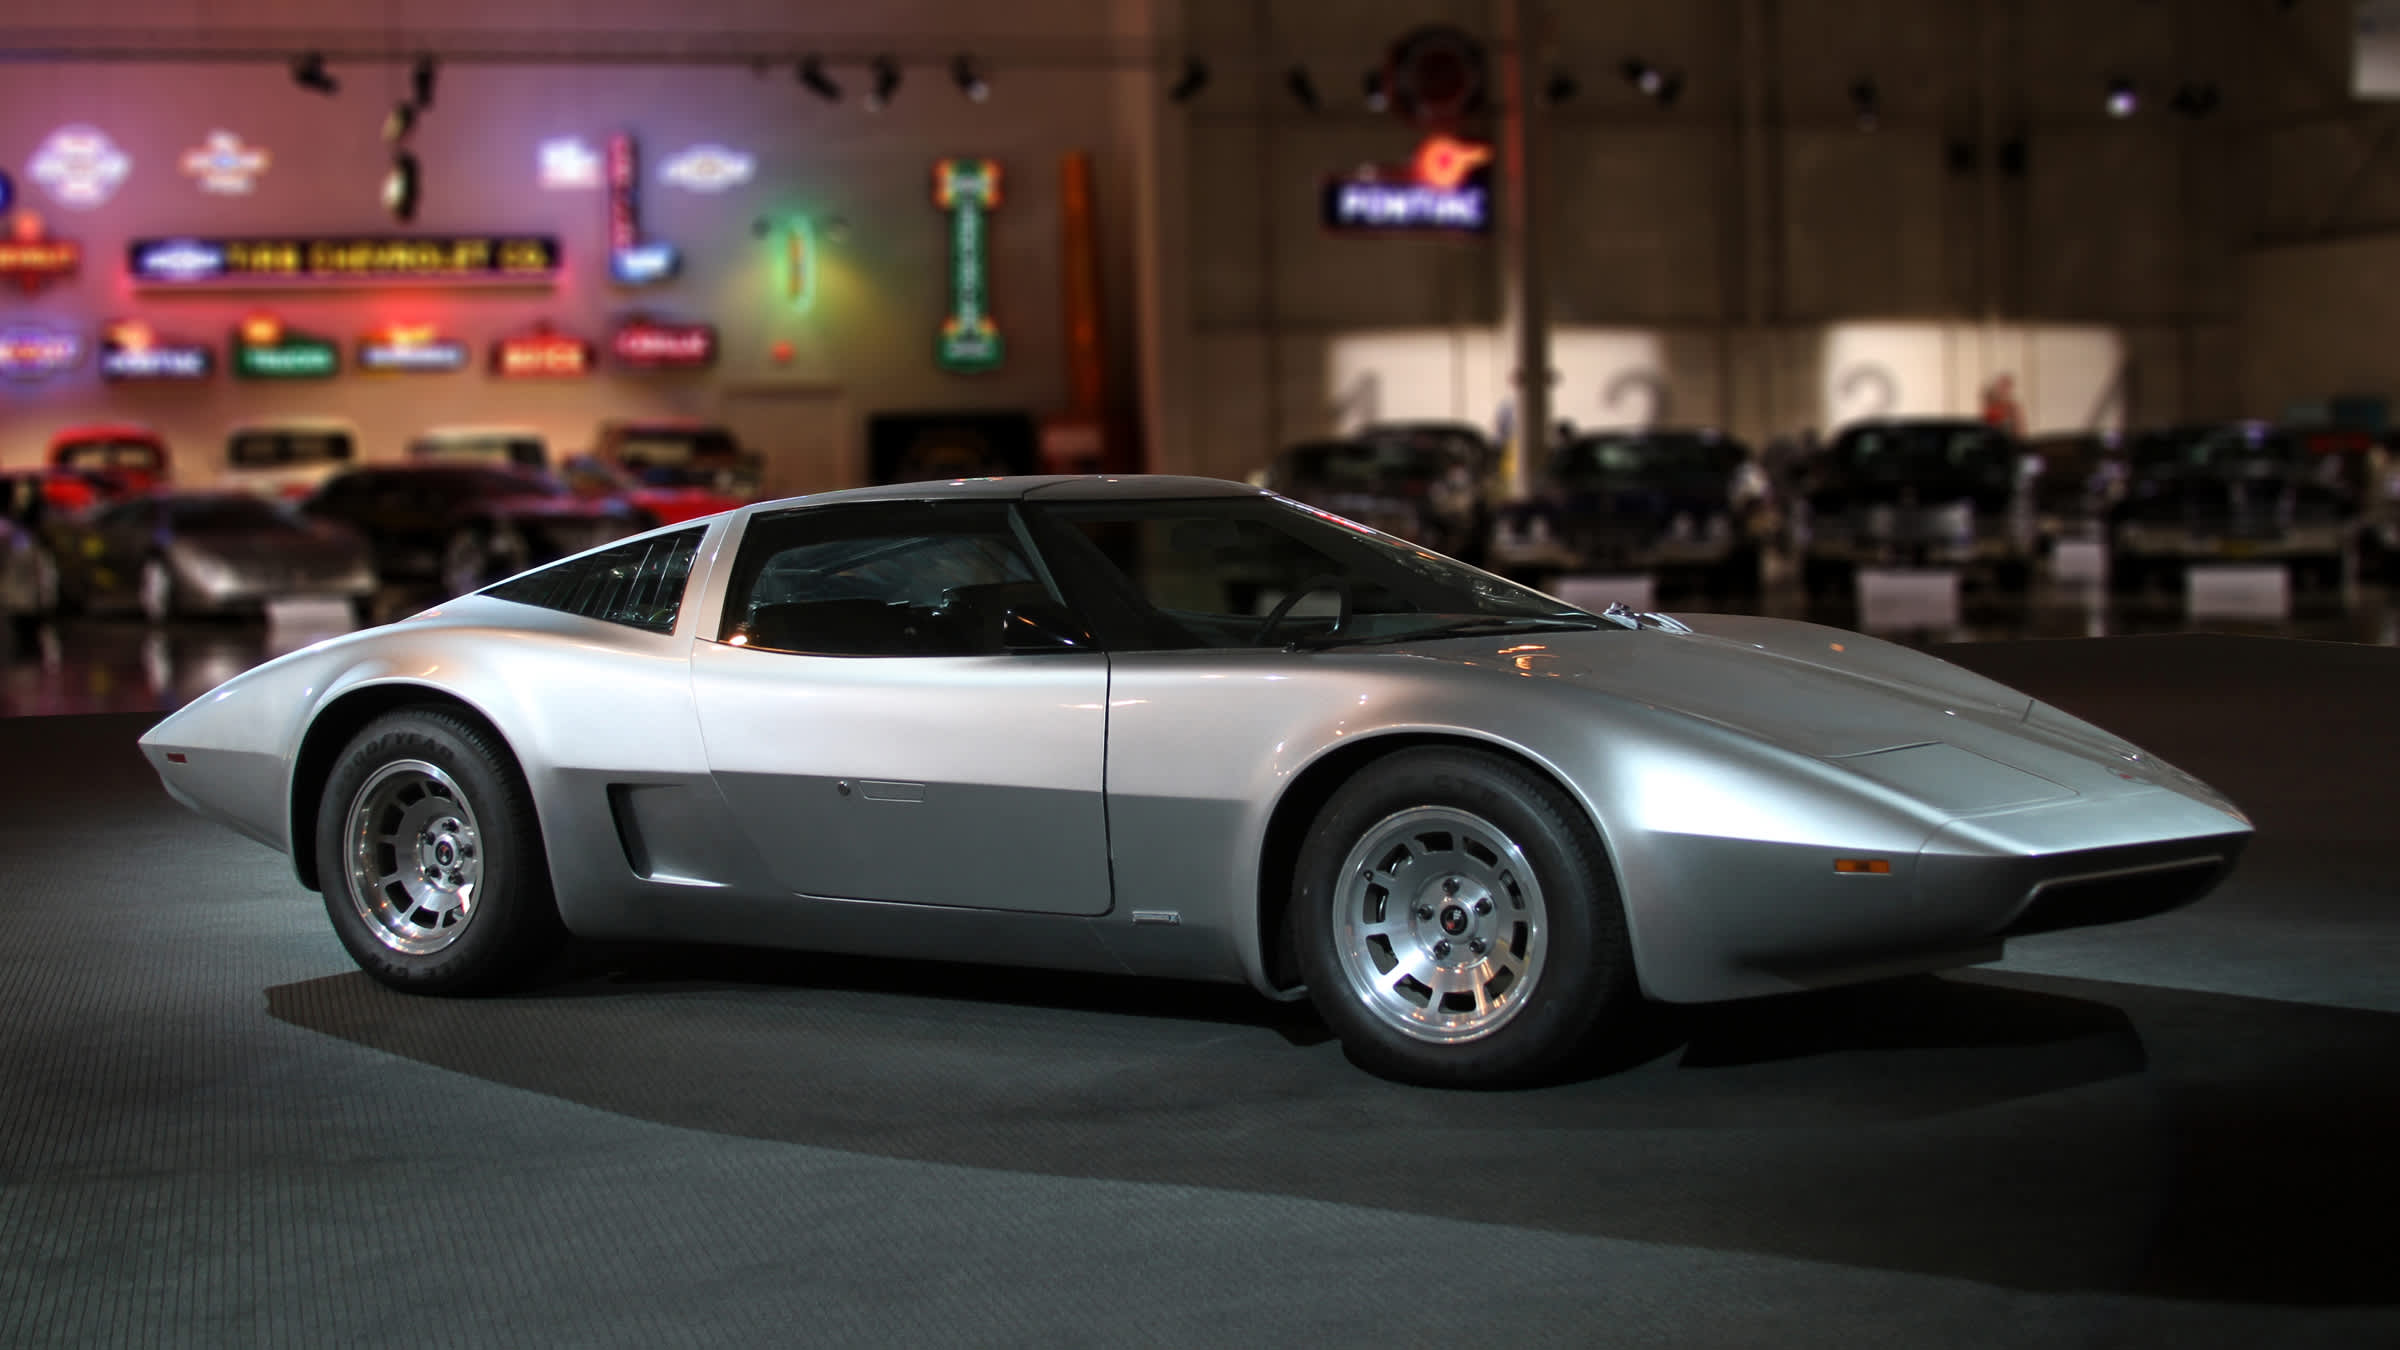 The C8 Chevy Corvette had many concept mid-engine